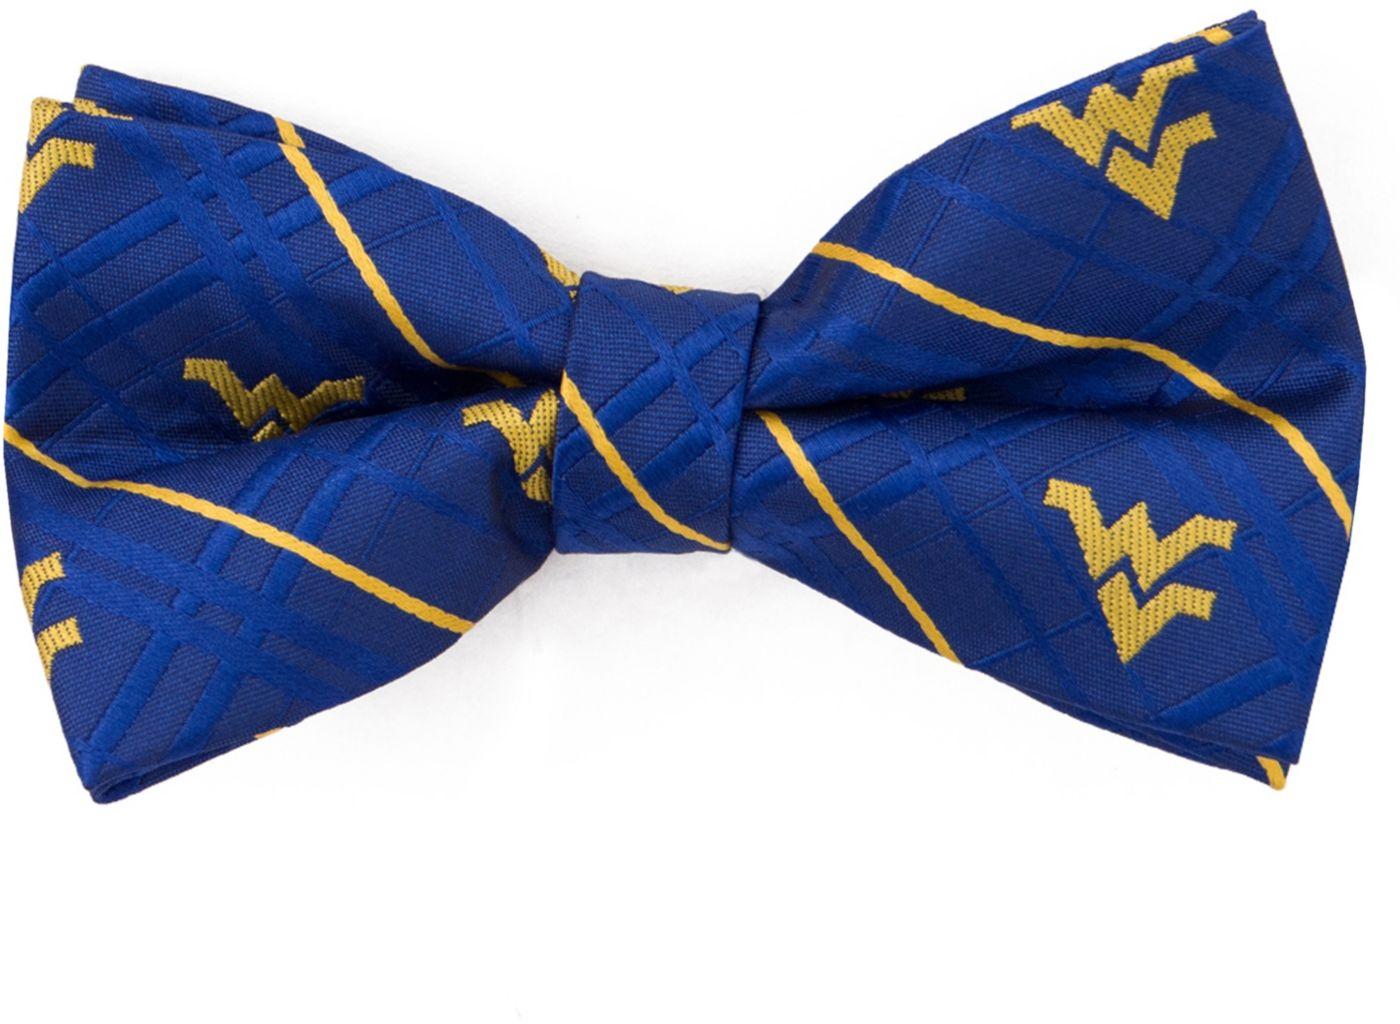 Eagles Wings West Virginia Mountaineers Oxford Bow Tie